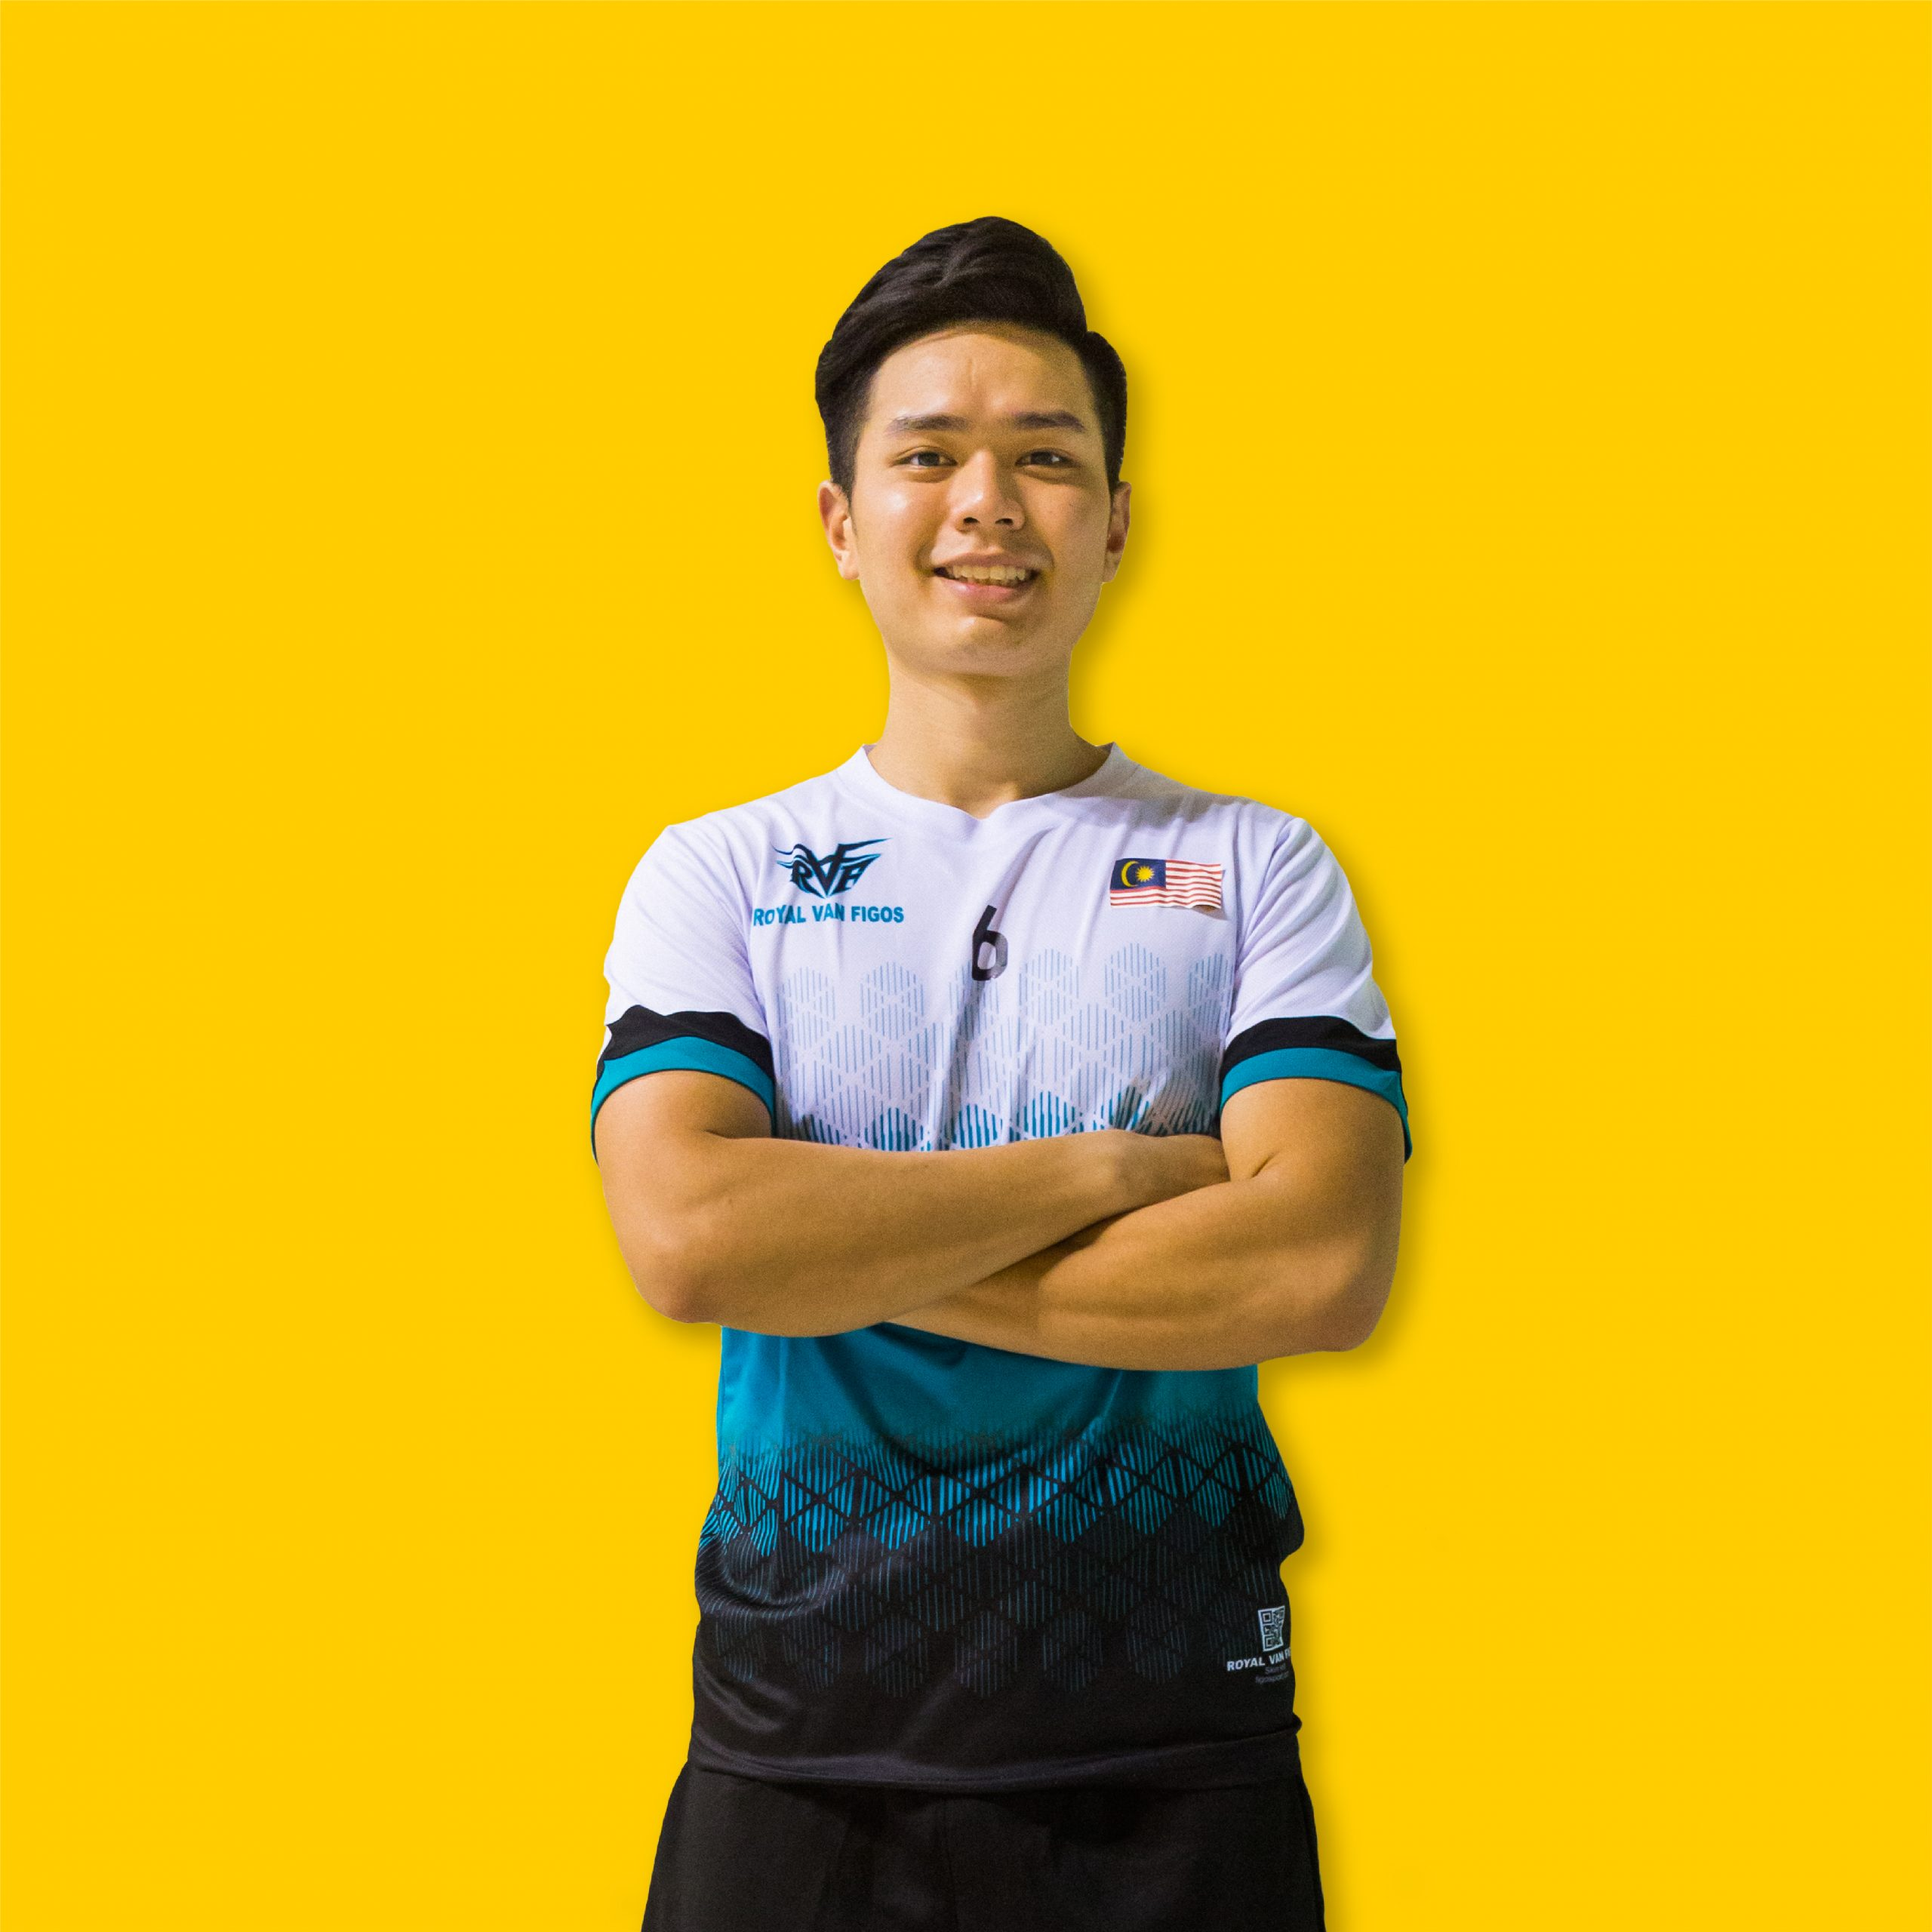 AOFC Cup 2019 : Korea 3 – 5 Malaysia Post Match Interview with Lim Kai Sheng